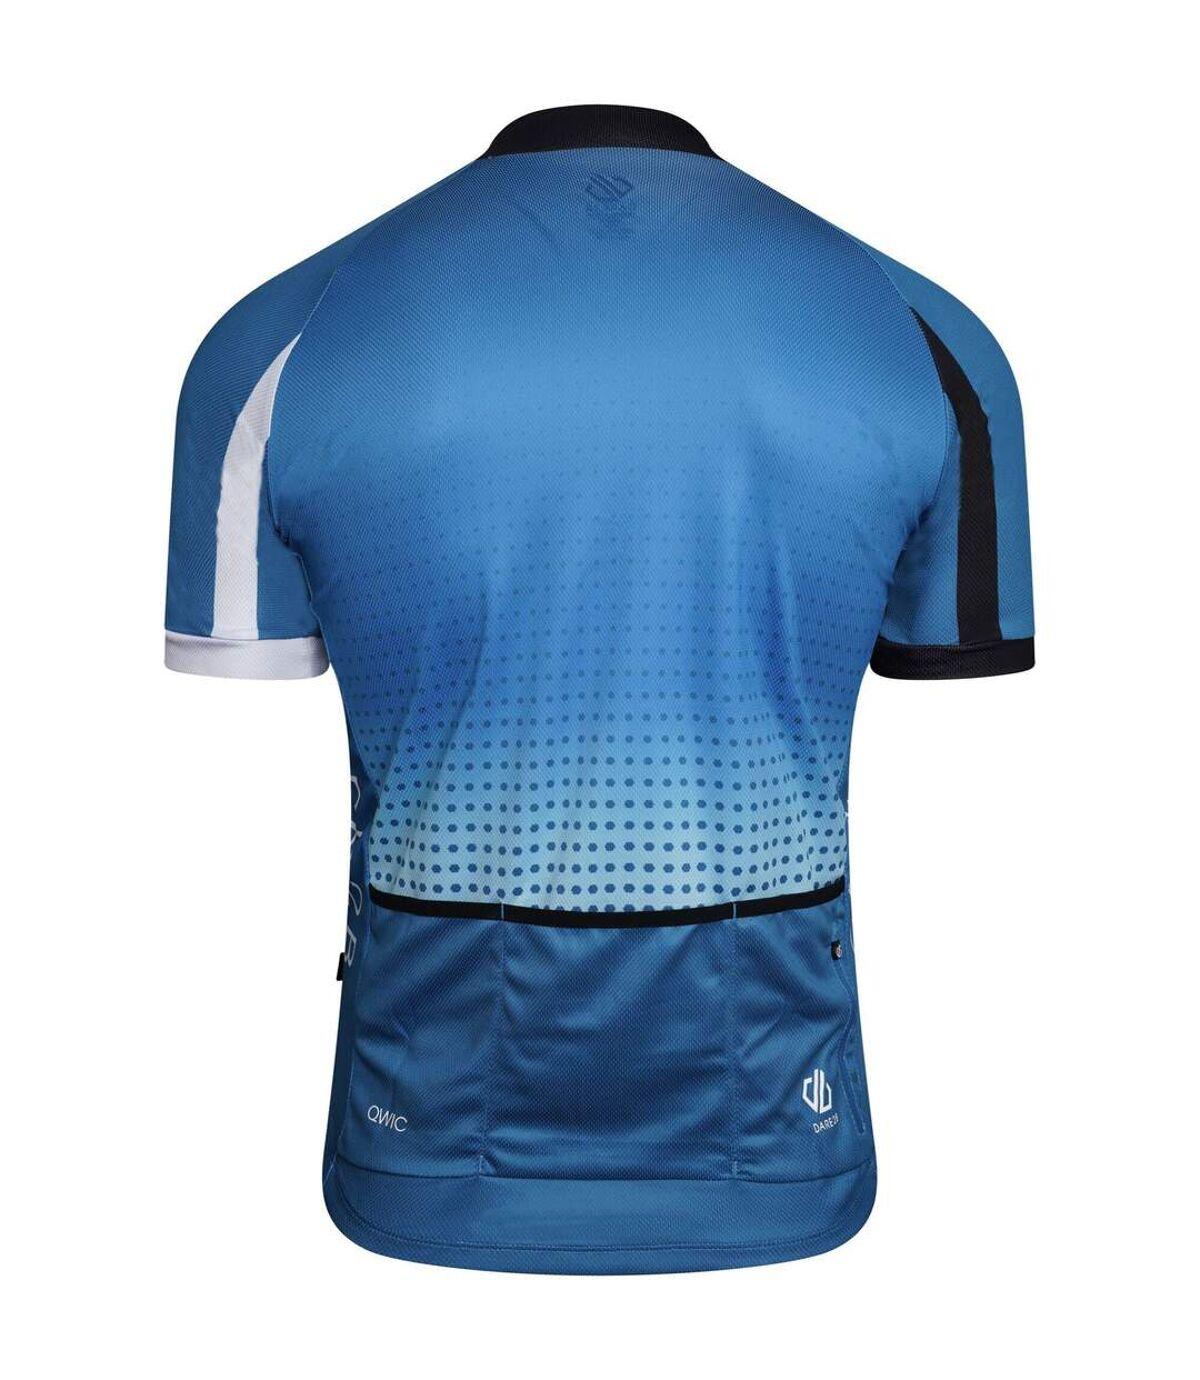 Dare 2B Mens Virtuosity Short-Sleeved Jersey (Petrol Blue/Black/White Gradient) - UTRG5835